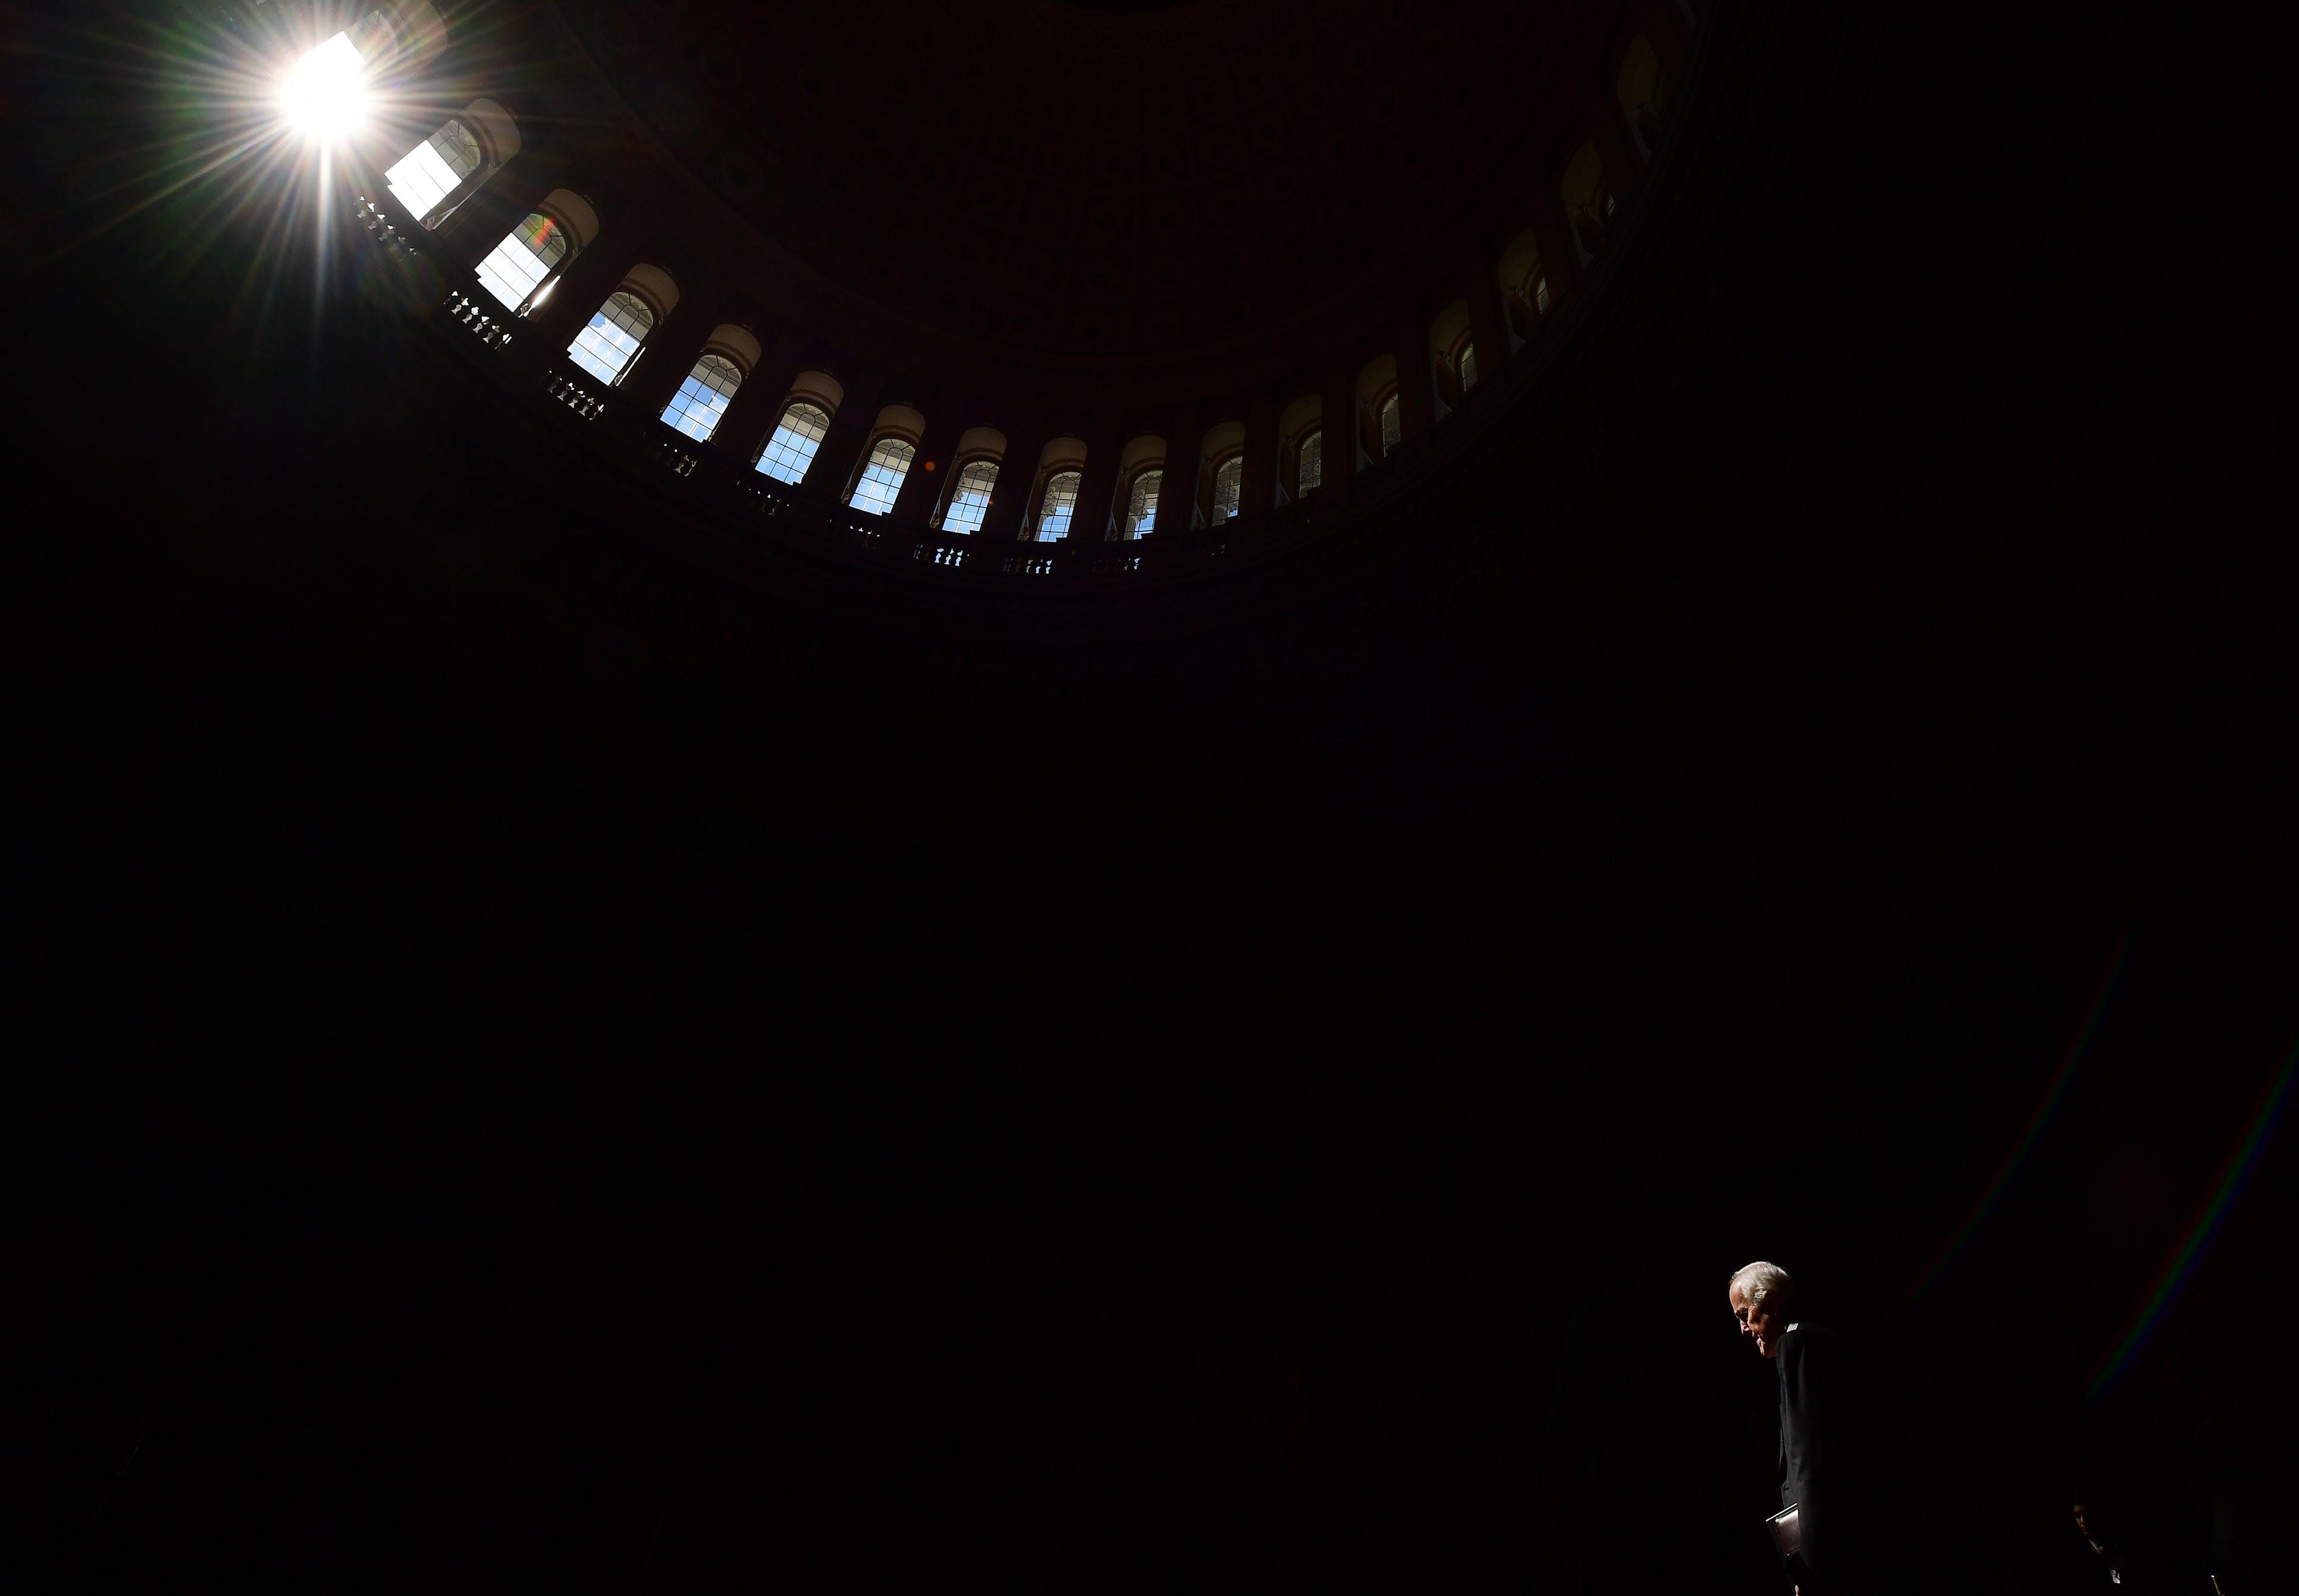 WASHINGTON, DC - MARCH 05: Senator John Cornyn (R-TX) walks through the United States Capitol rotunda on Tuesday March 05, 2019 in Washington, DC. (Photo by Matt McClain/The Washington Post via Getty Images)